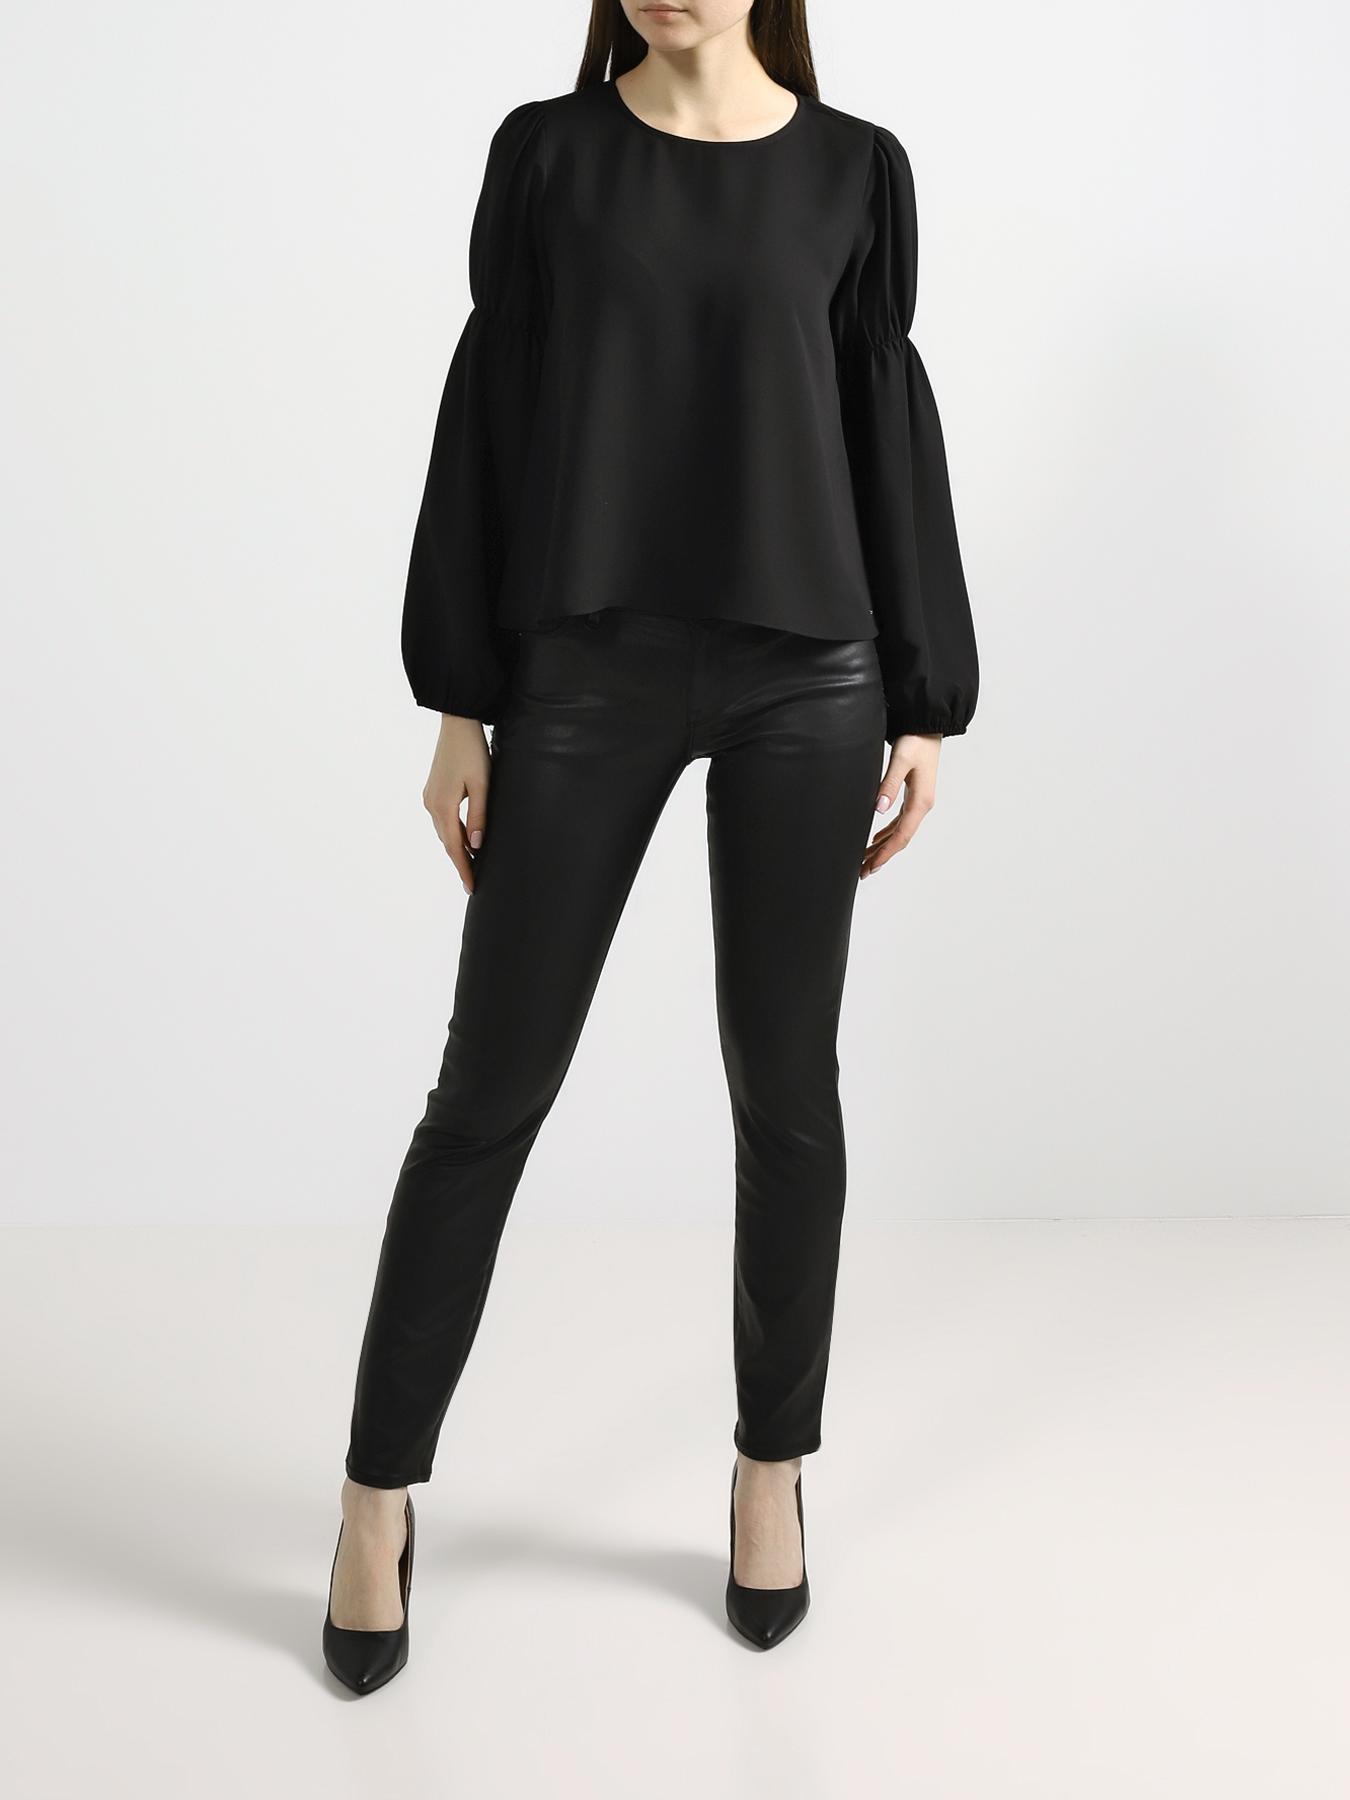 Блуза Armani Exchange Блузка с длинным рукавом